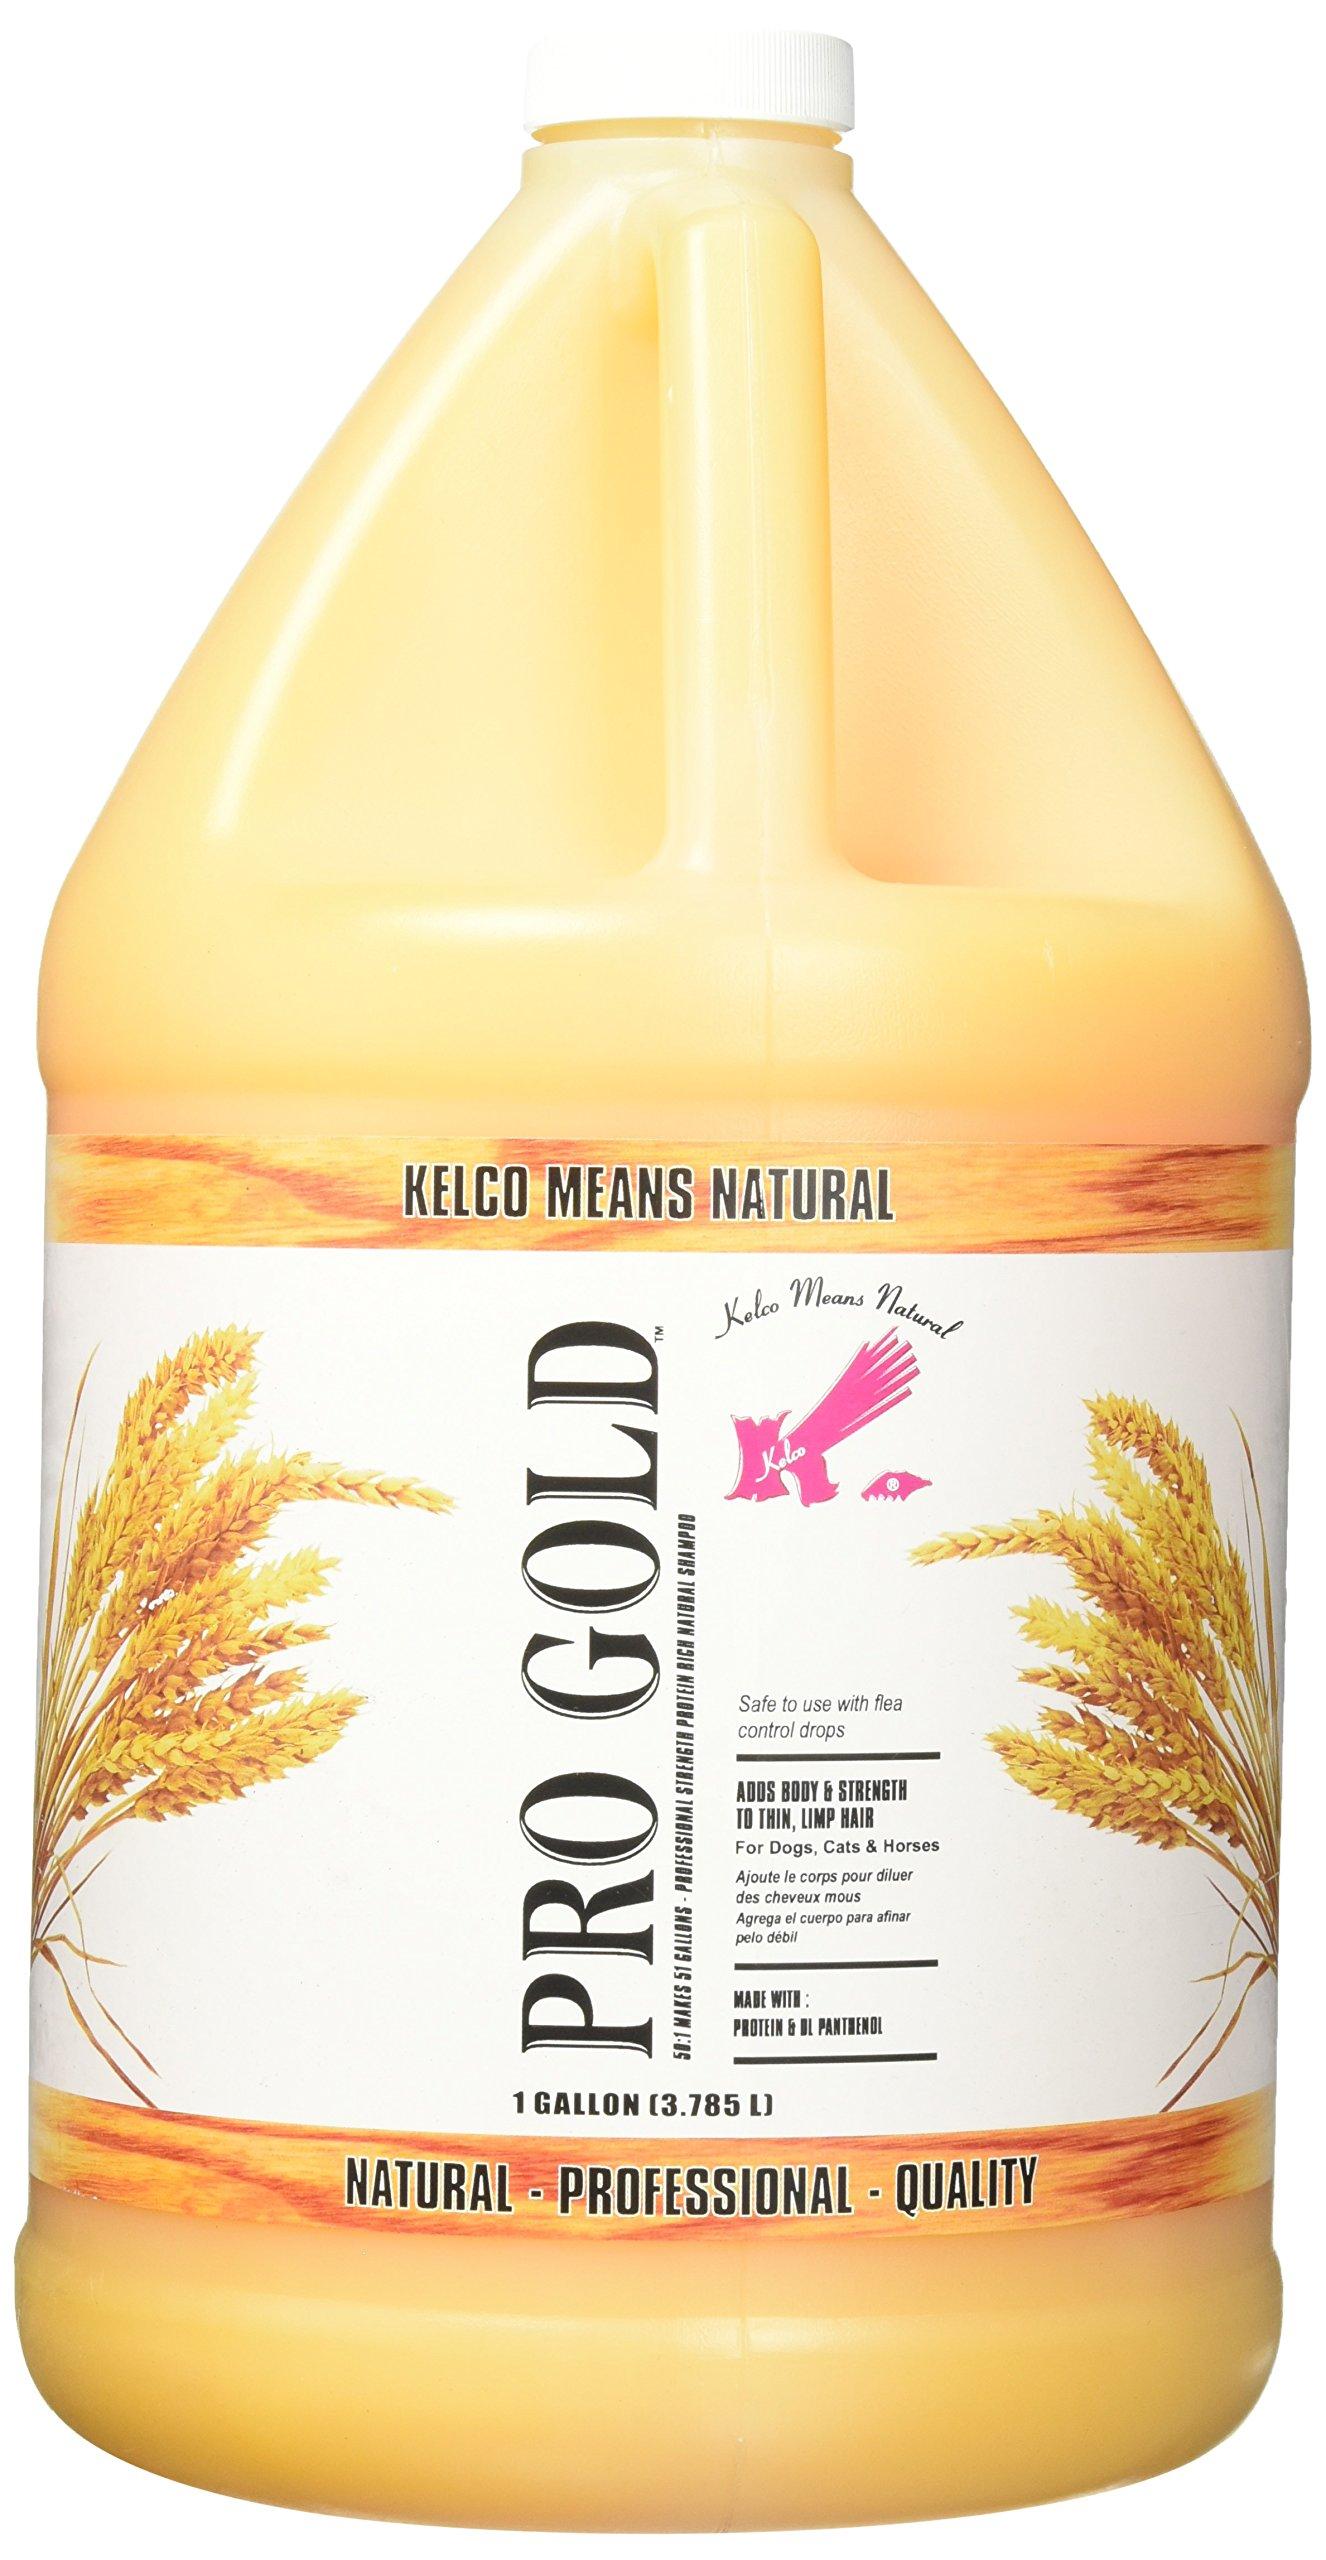 Kelco Pro Gold Shampoo Gallon by Kelco